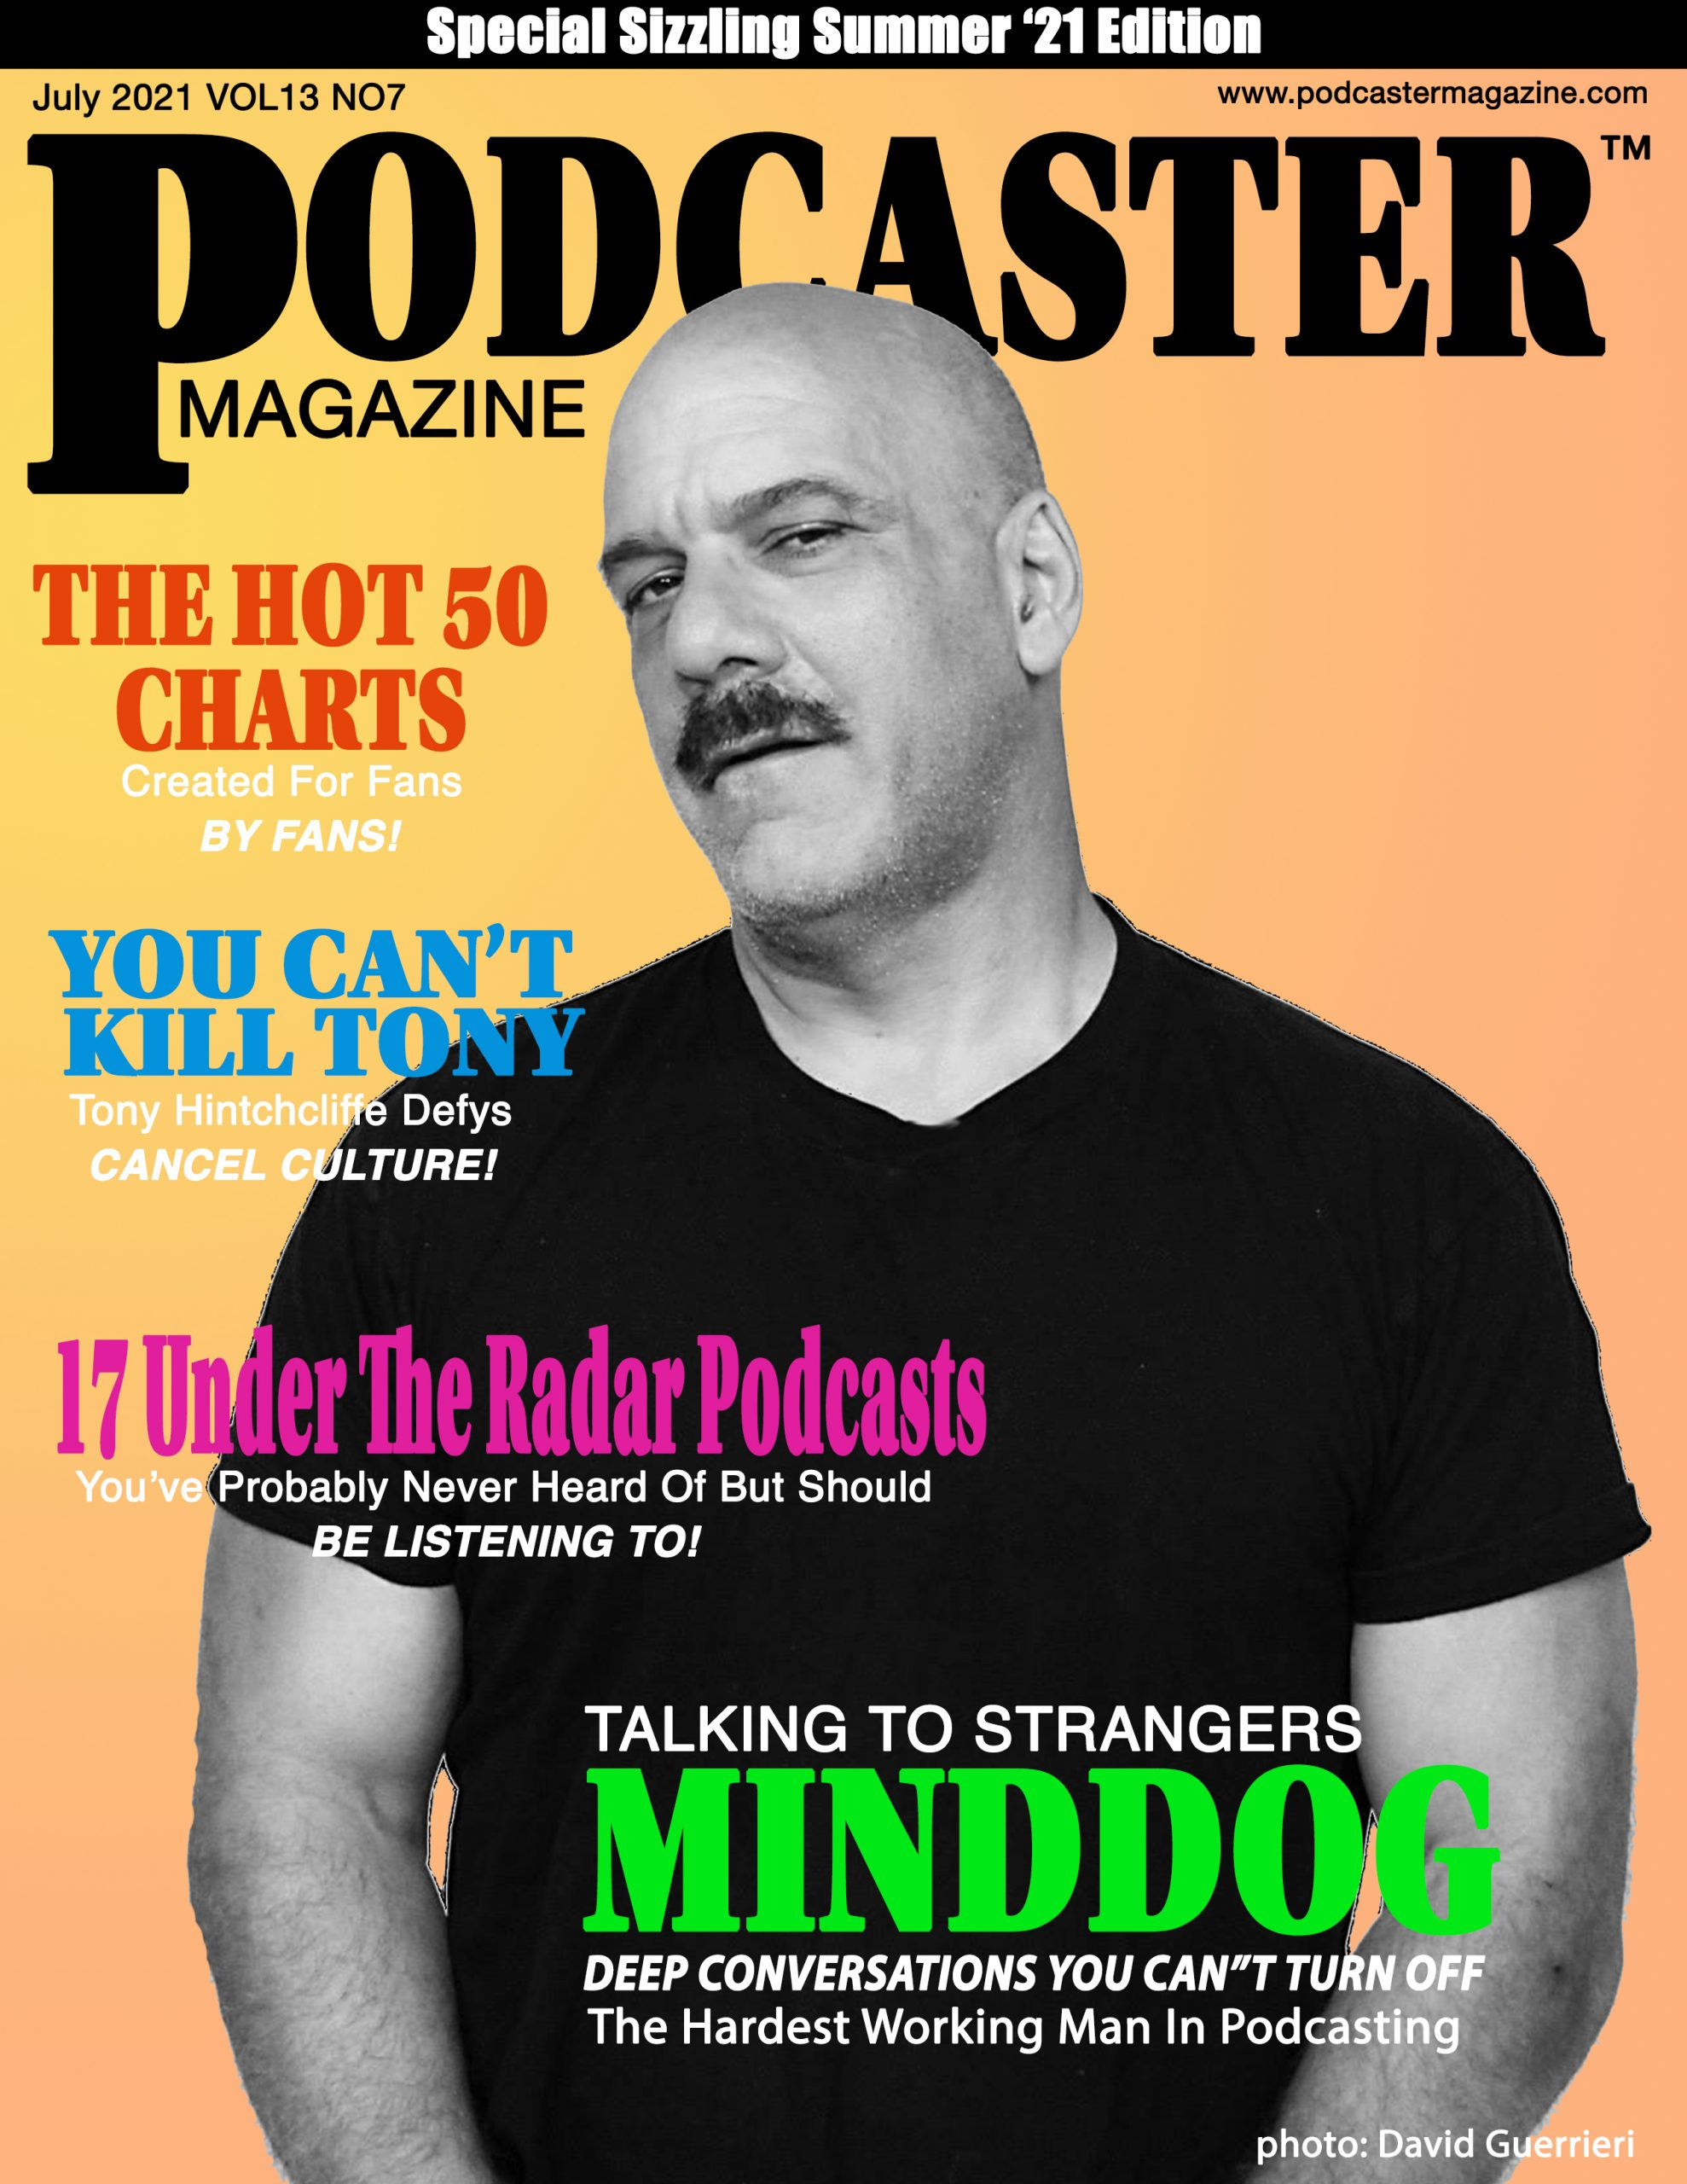 podcast magazine cover